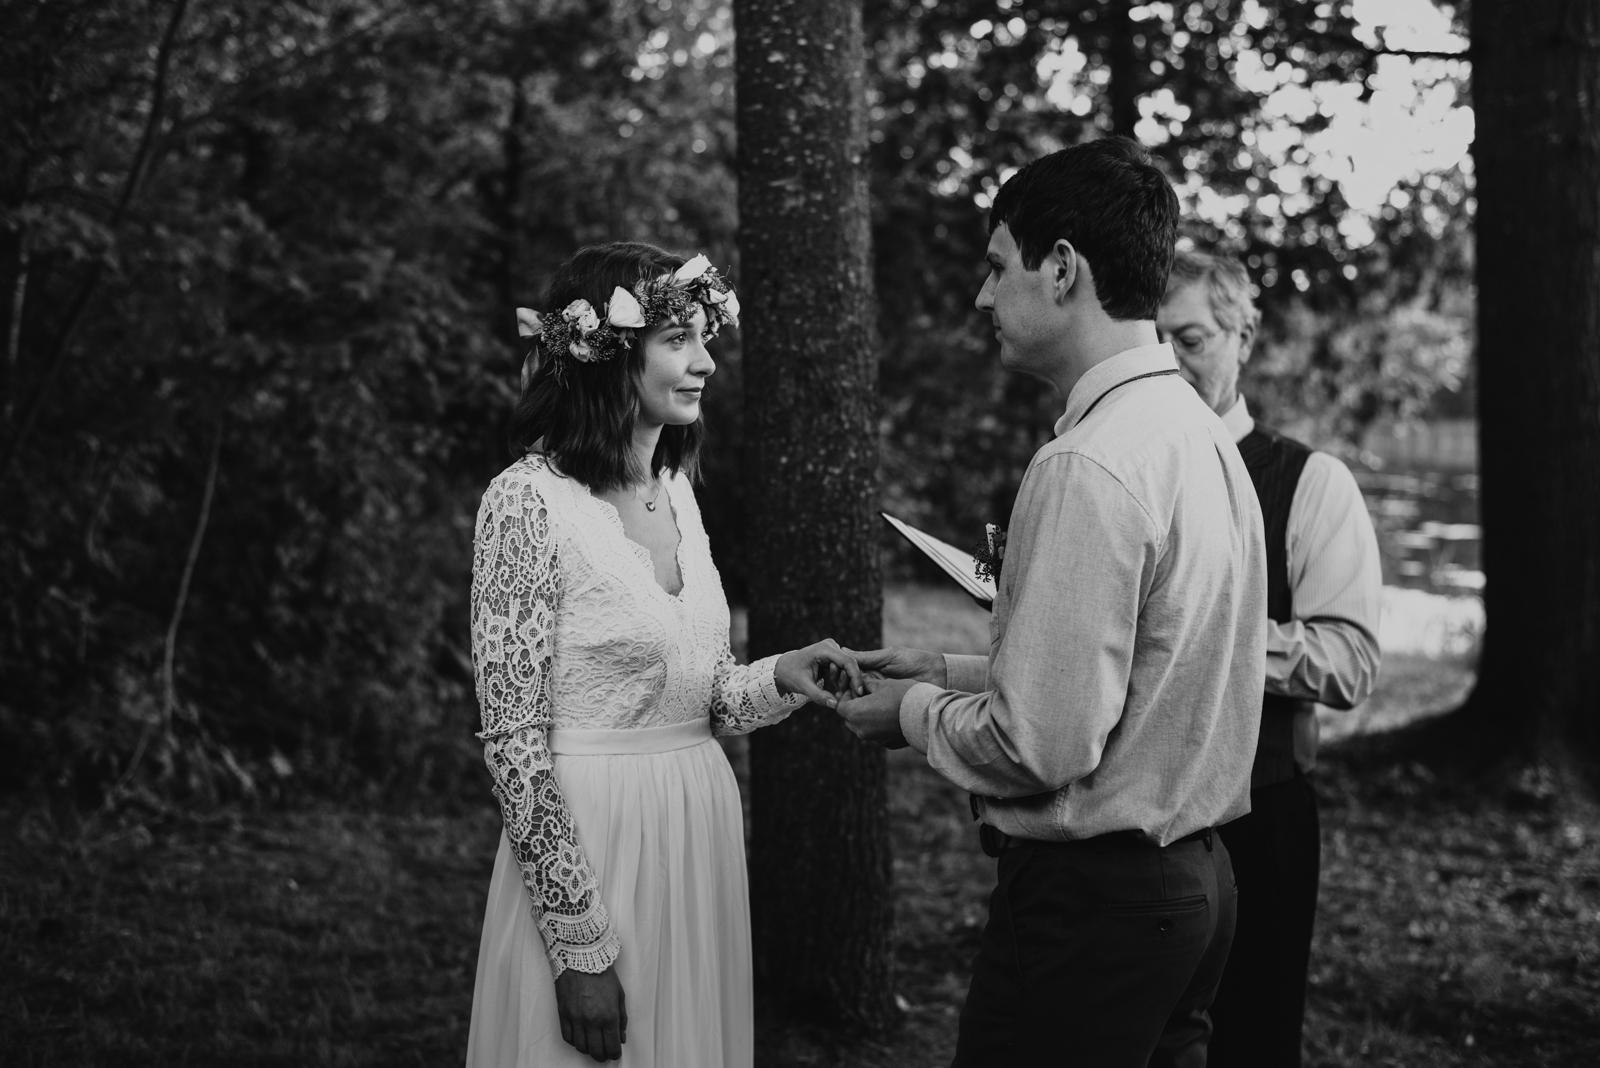 08192018-JessicaJordan-JuliaLuckettPhotography-108.jpg